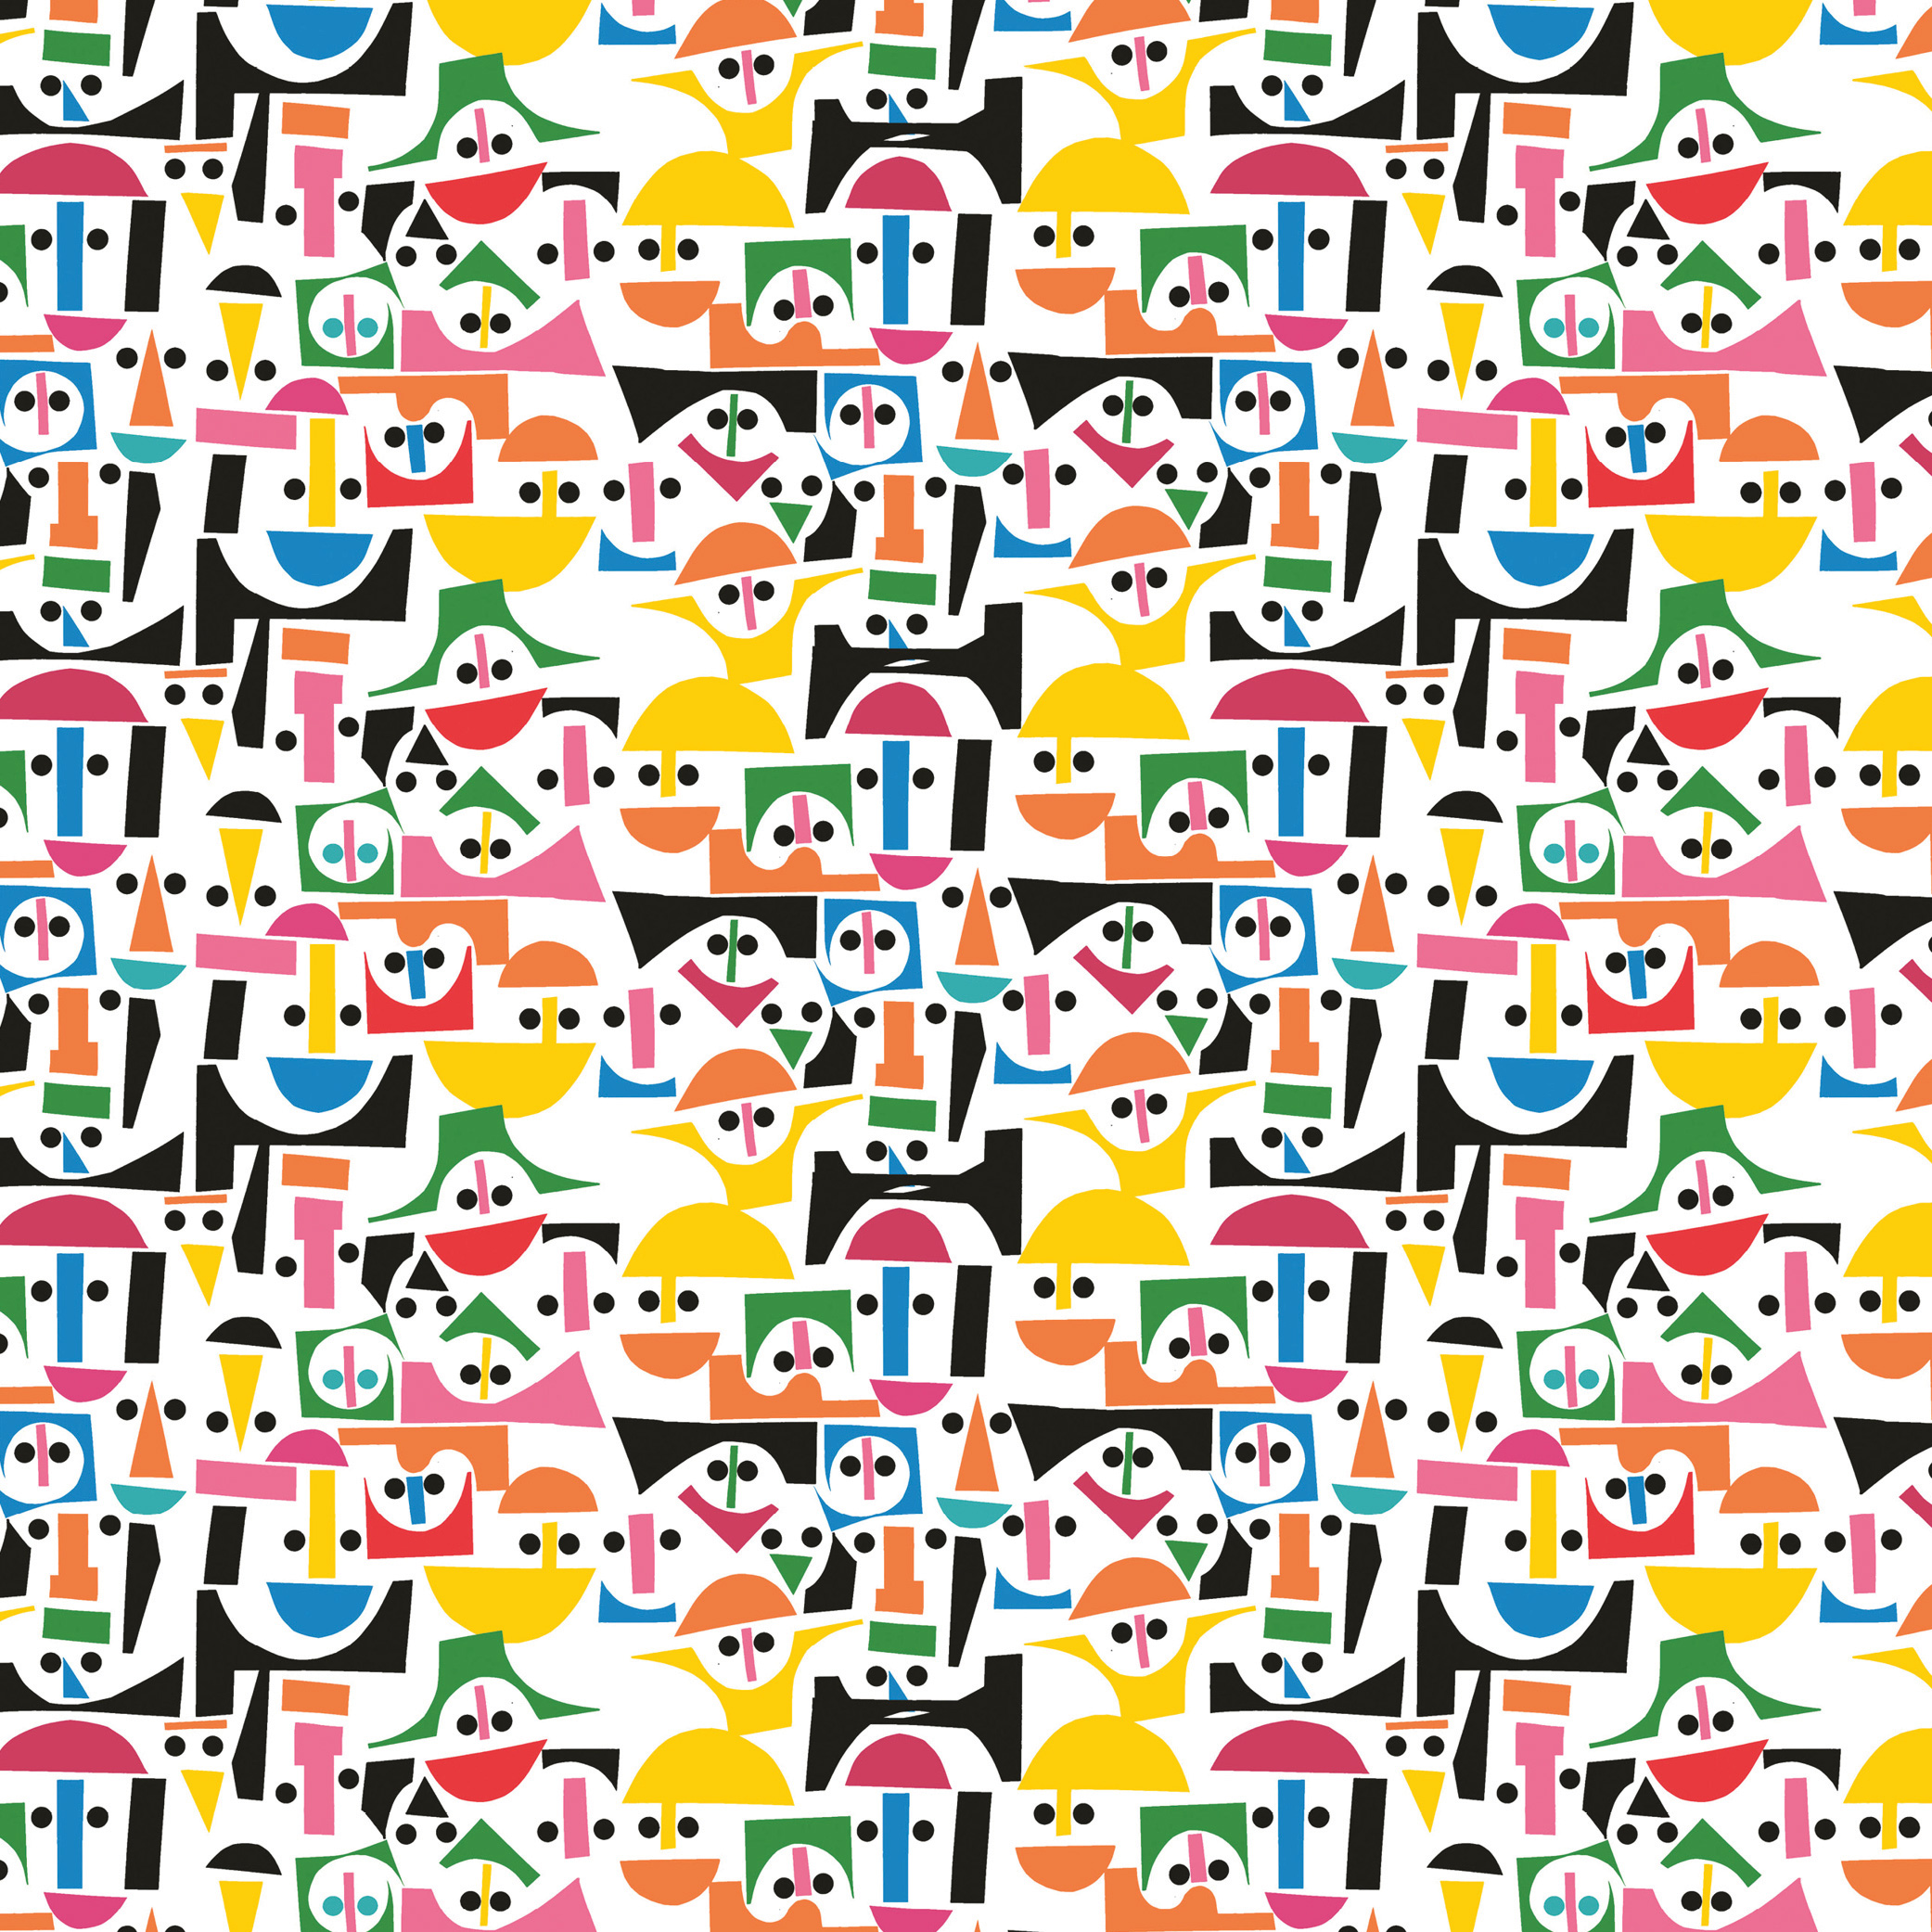 Marcus_Walters_InHouse_Pattern-Smile_WEB.jpg